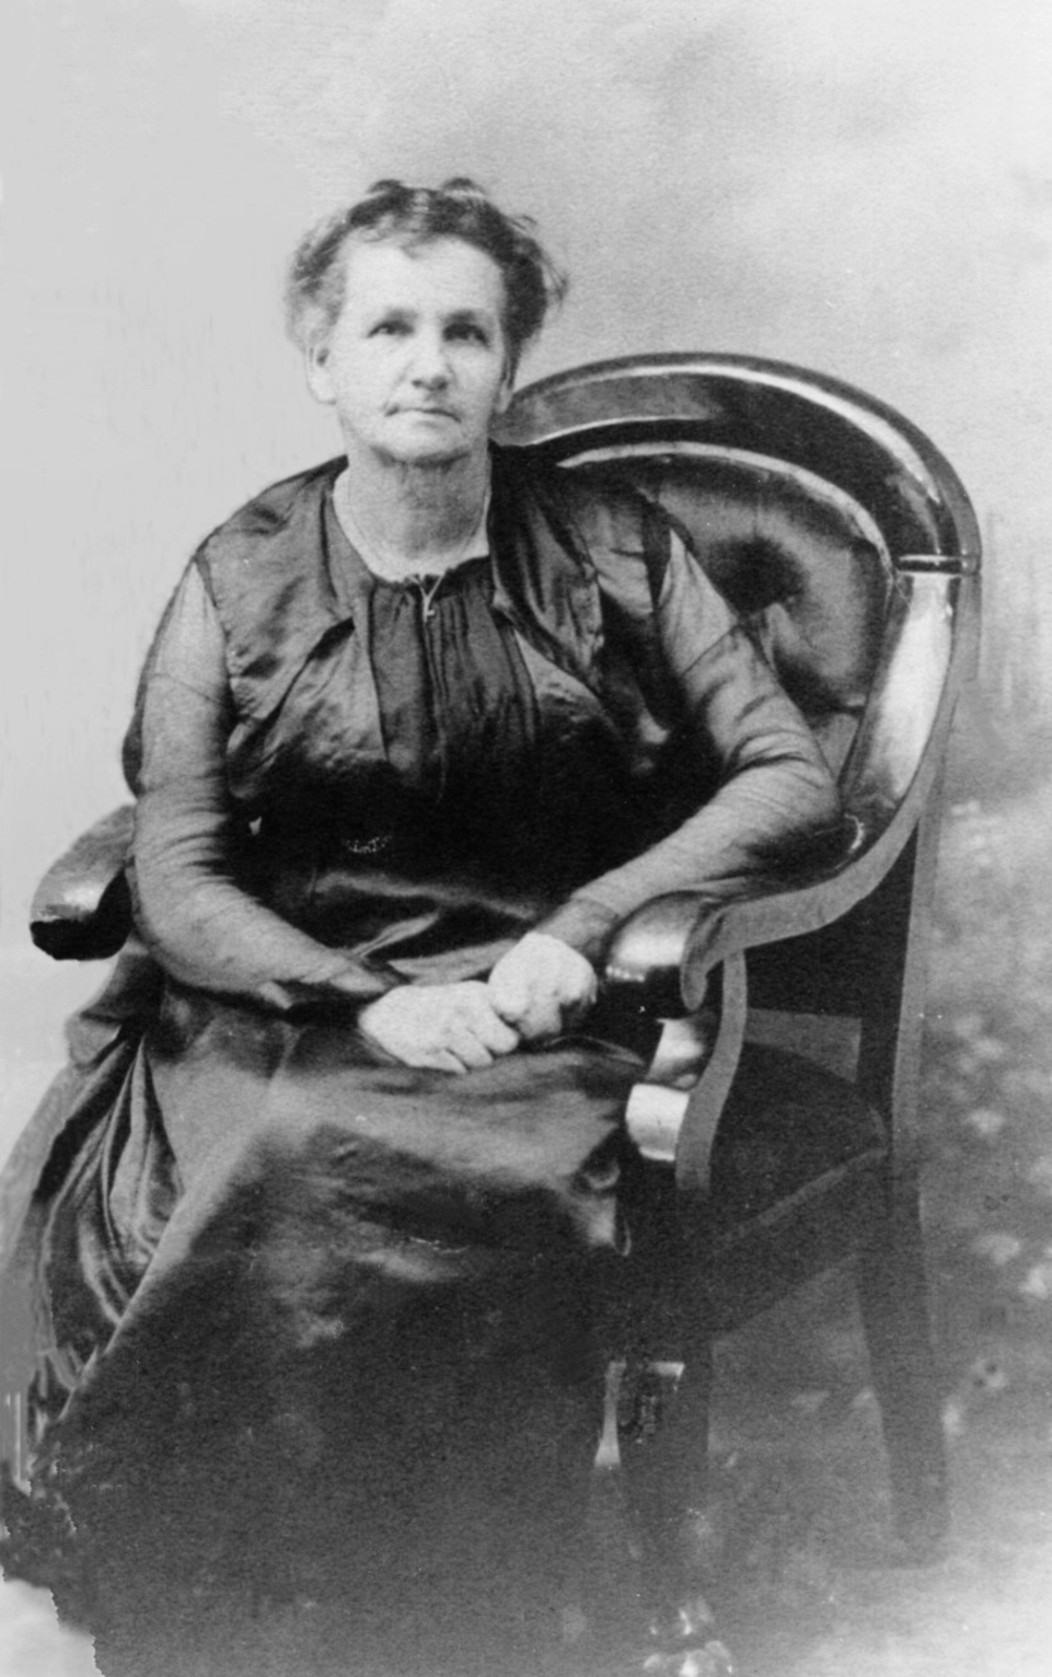 Edvea Ann Montri